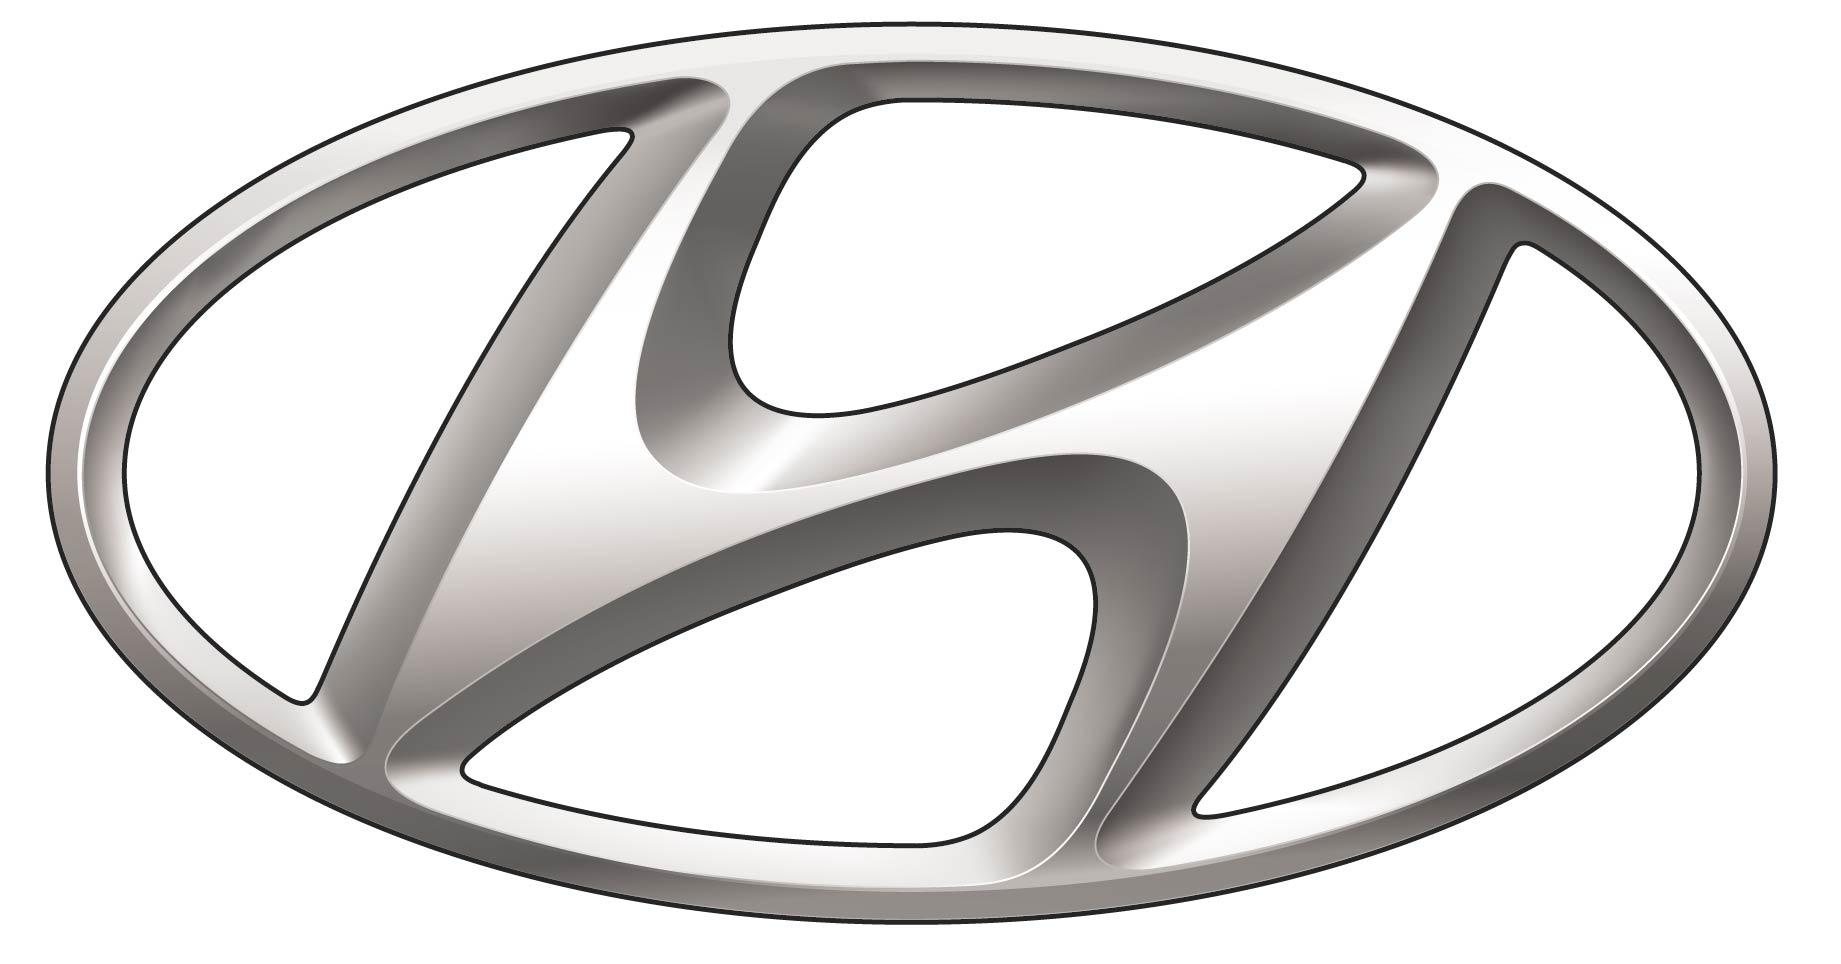 hyundai logotip